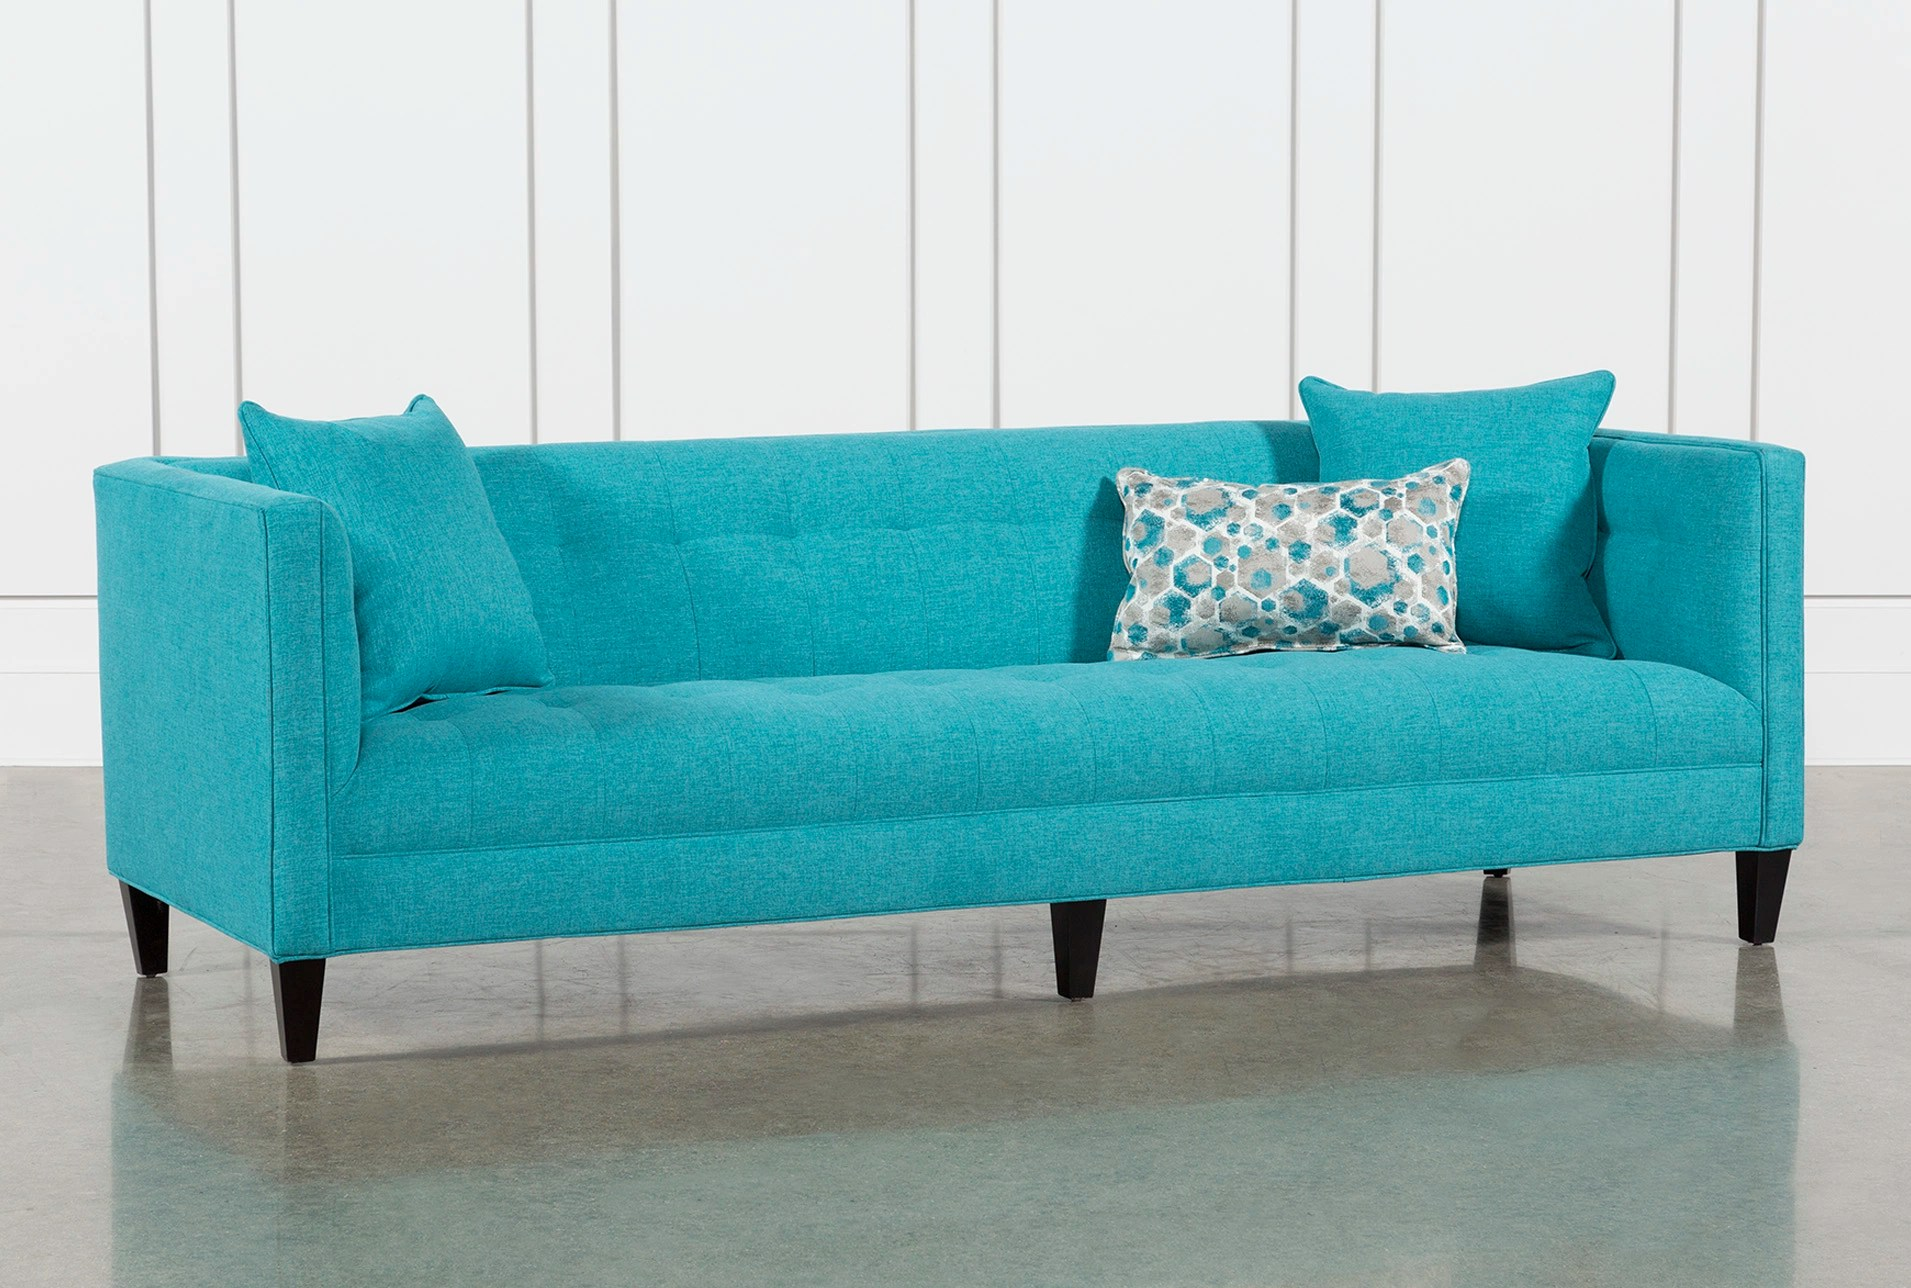 milo corner sofa groupon review cream velvet home the honoroak